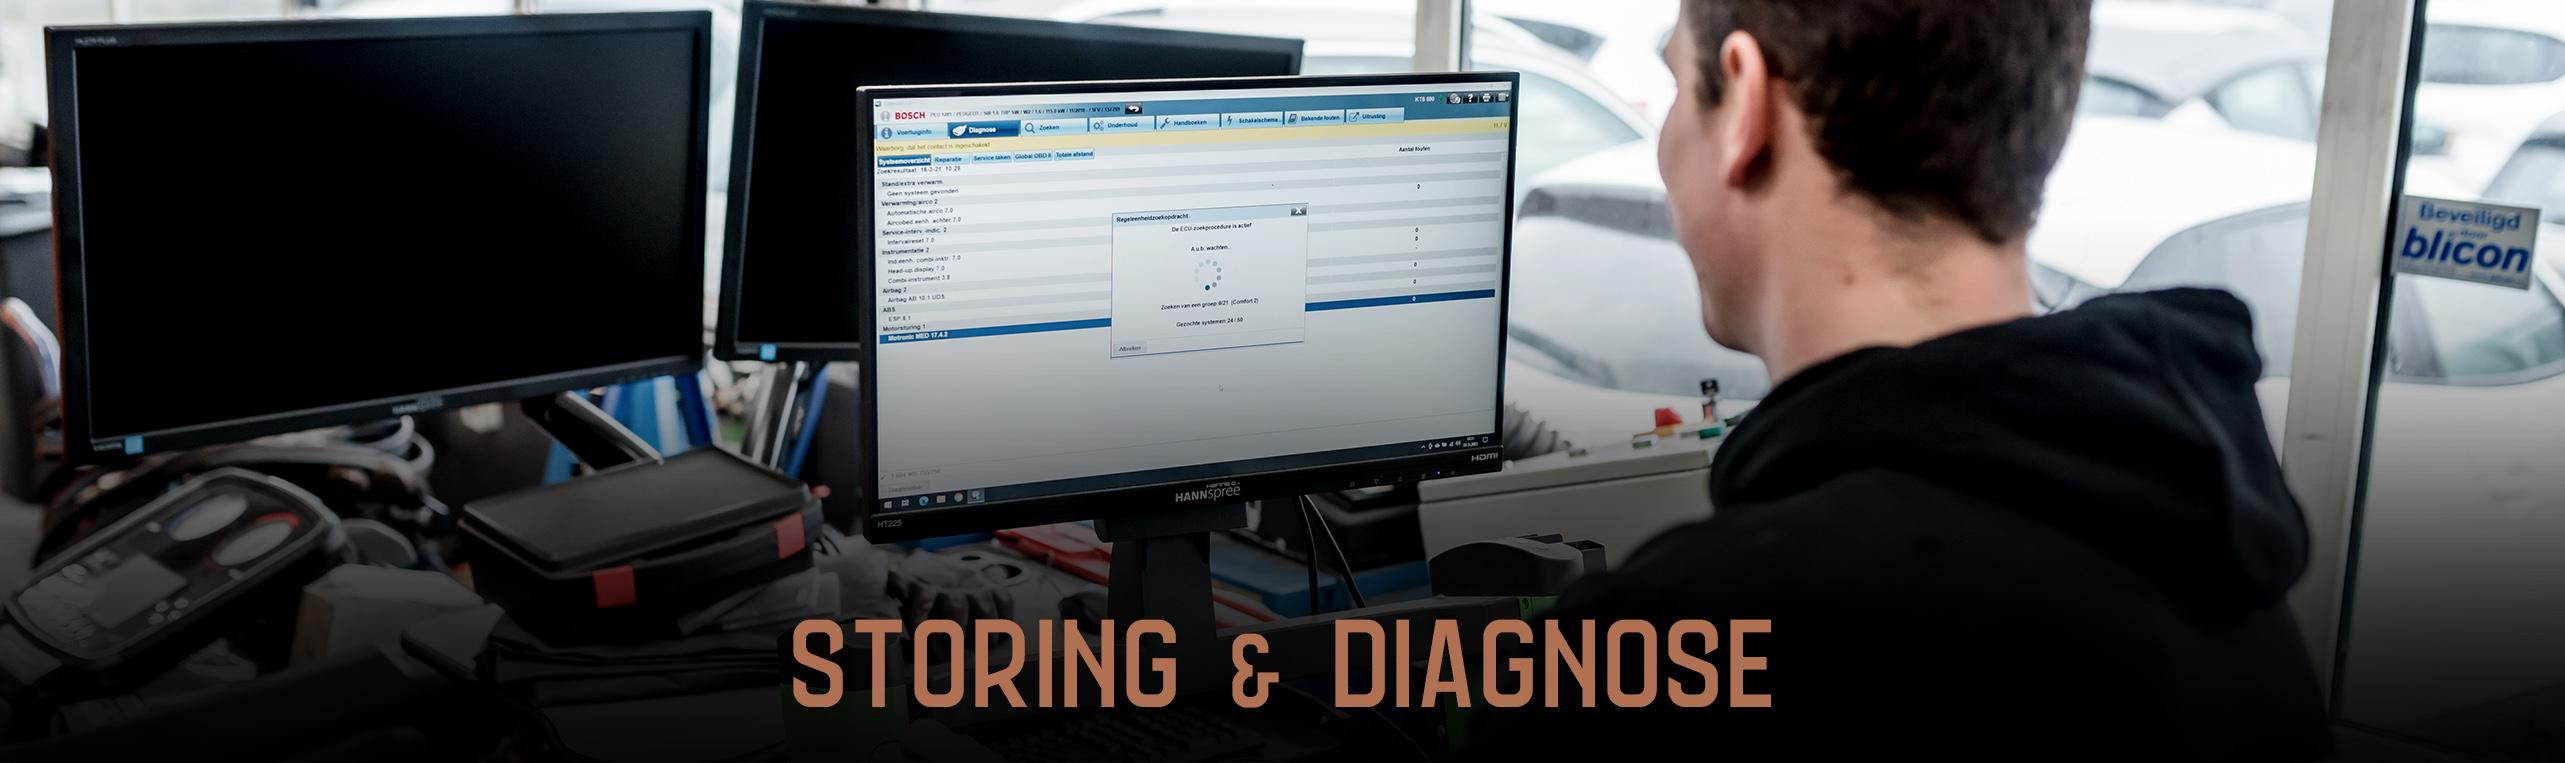 Storingsdiagnose